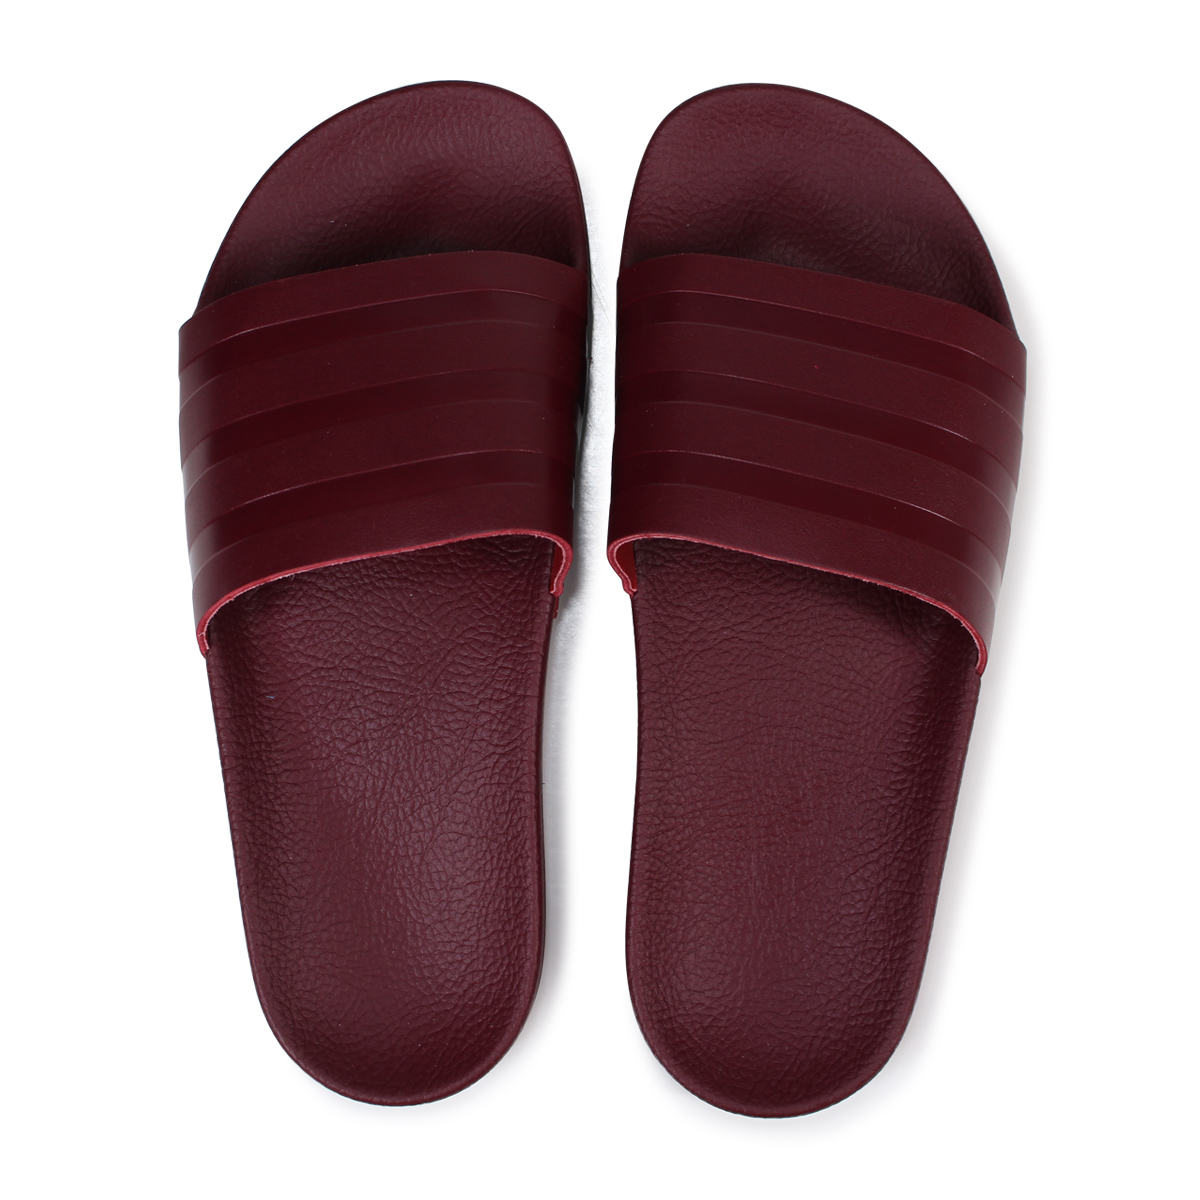 472b3025bcfb80 ALLSPORTS  アディダスアディレッタ adidas Originals sandals shower ...